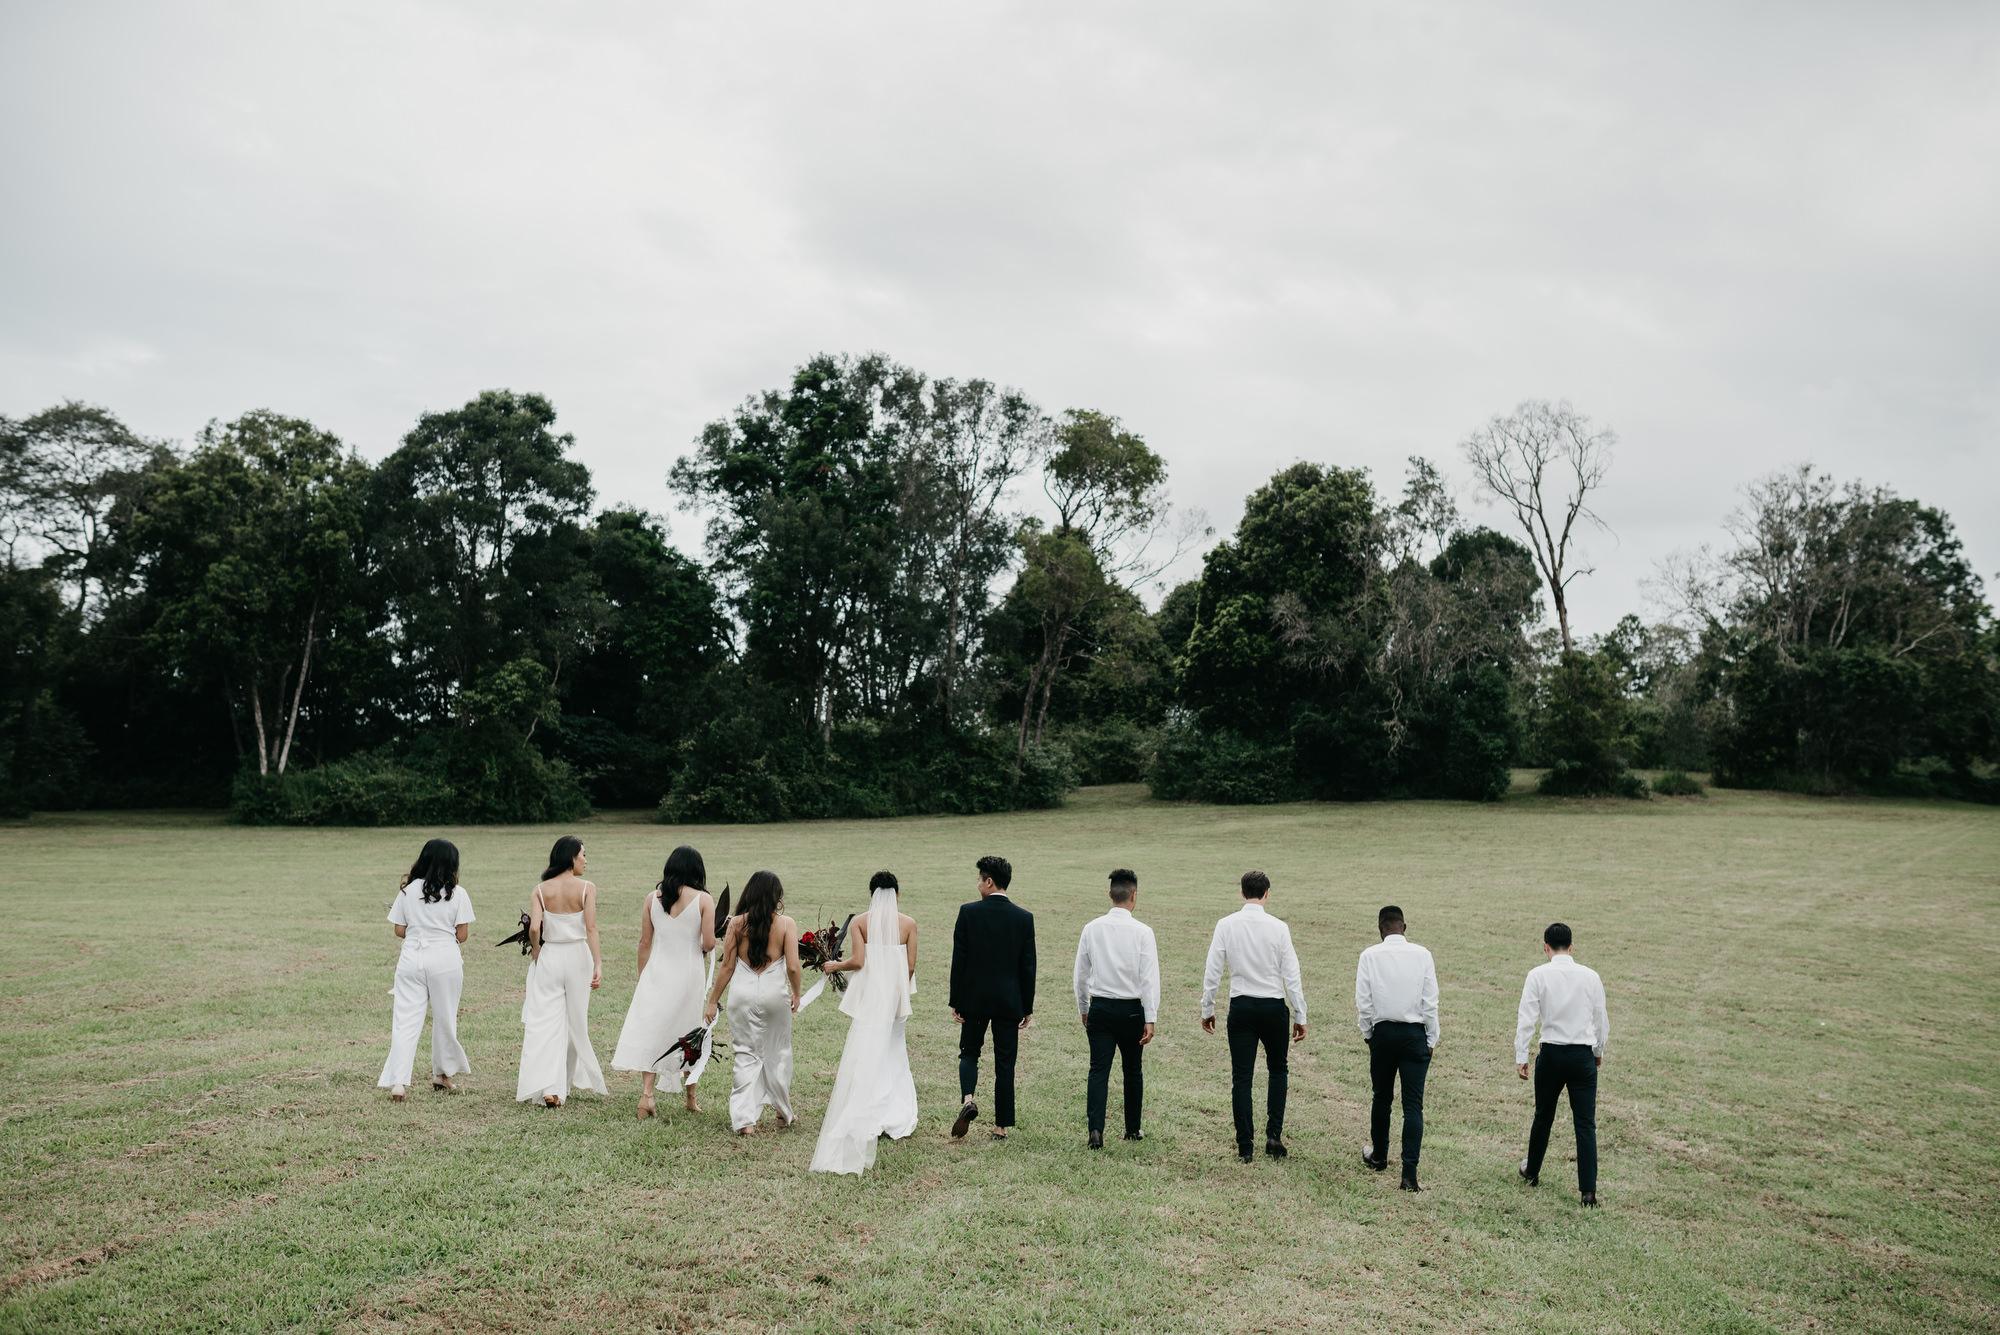 EPHEMERAL CREATIVE Falls Farm wedding Sunshine Coast bridal party